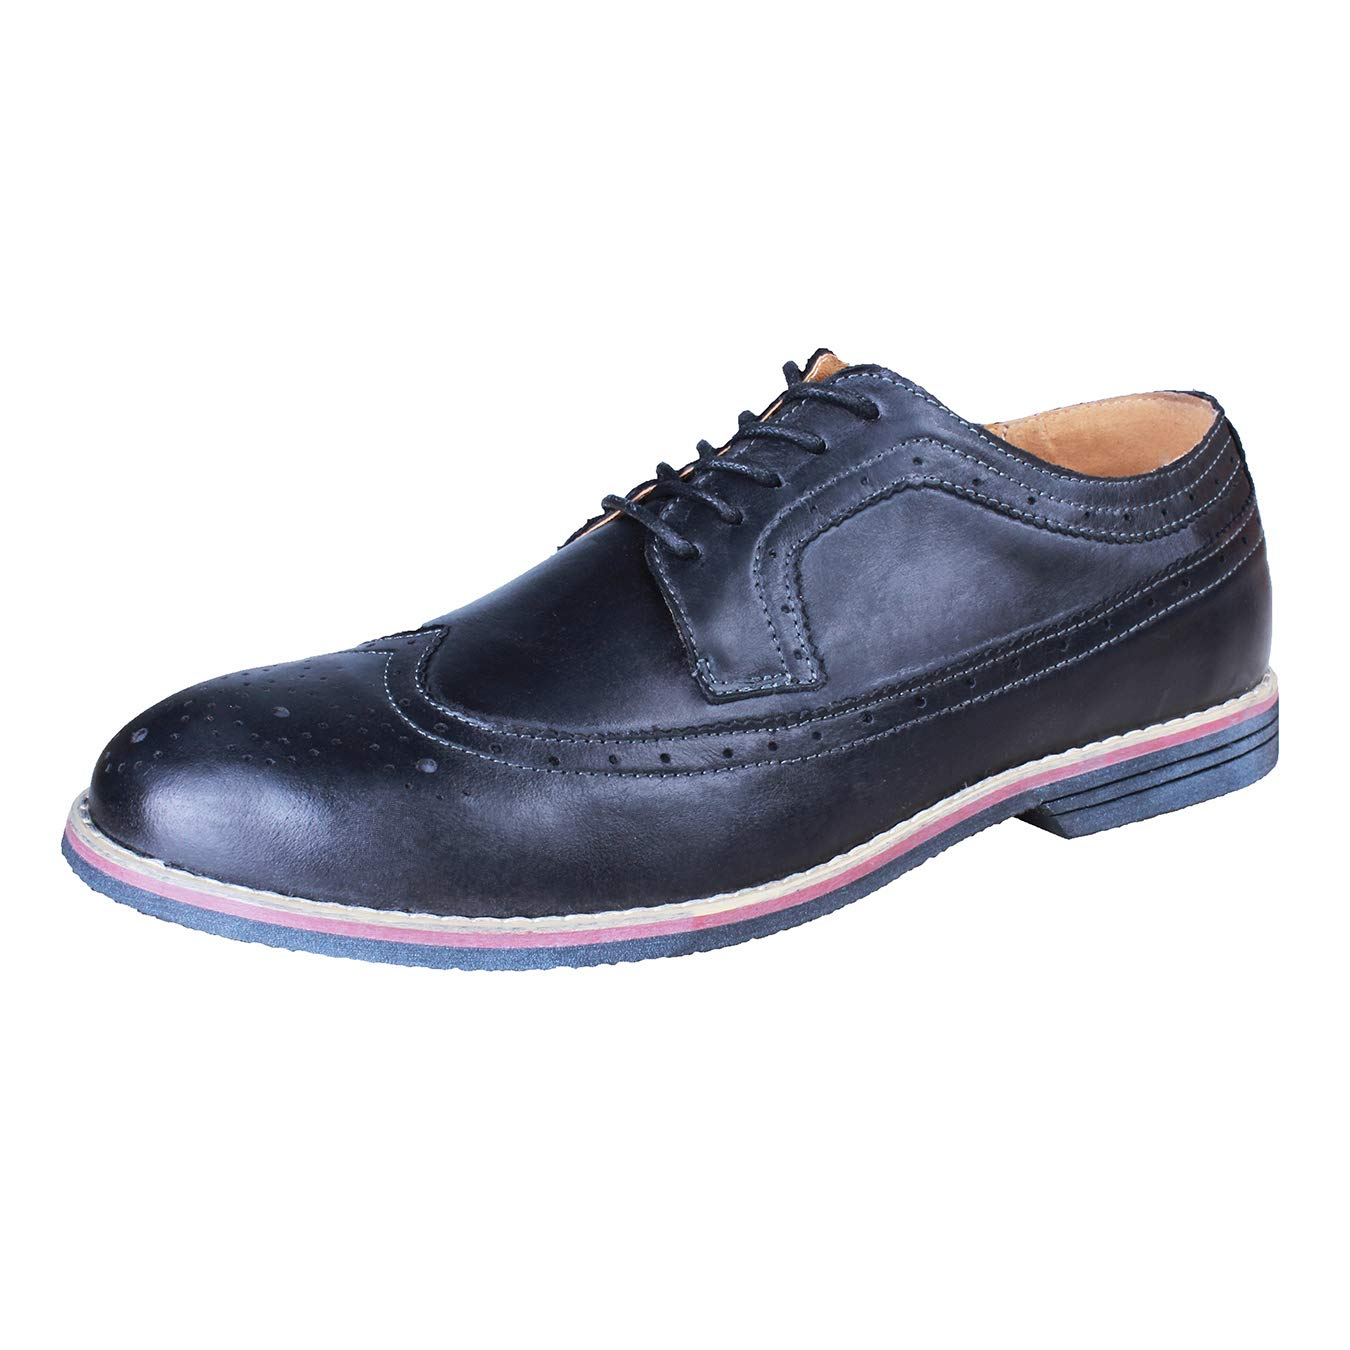 PhiFA Men's Leather Classic Oxford Dress Shoes Lace-up US Size 10 Black